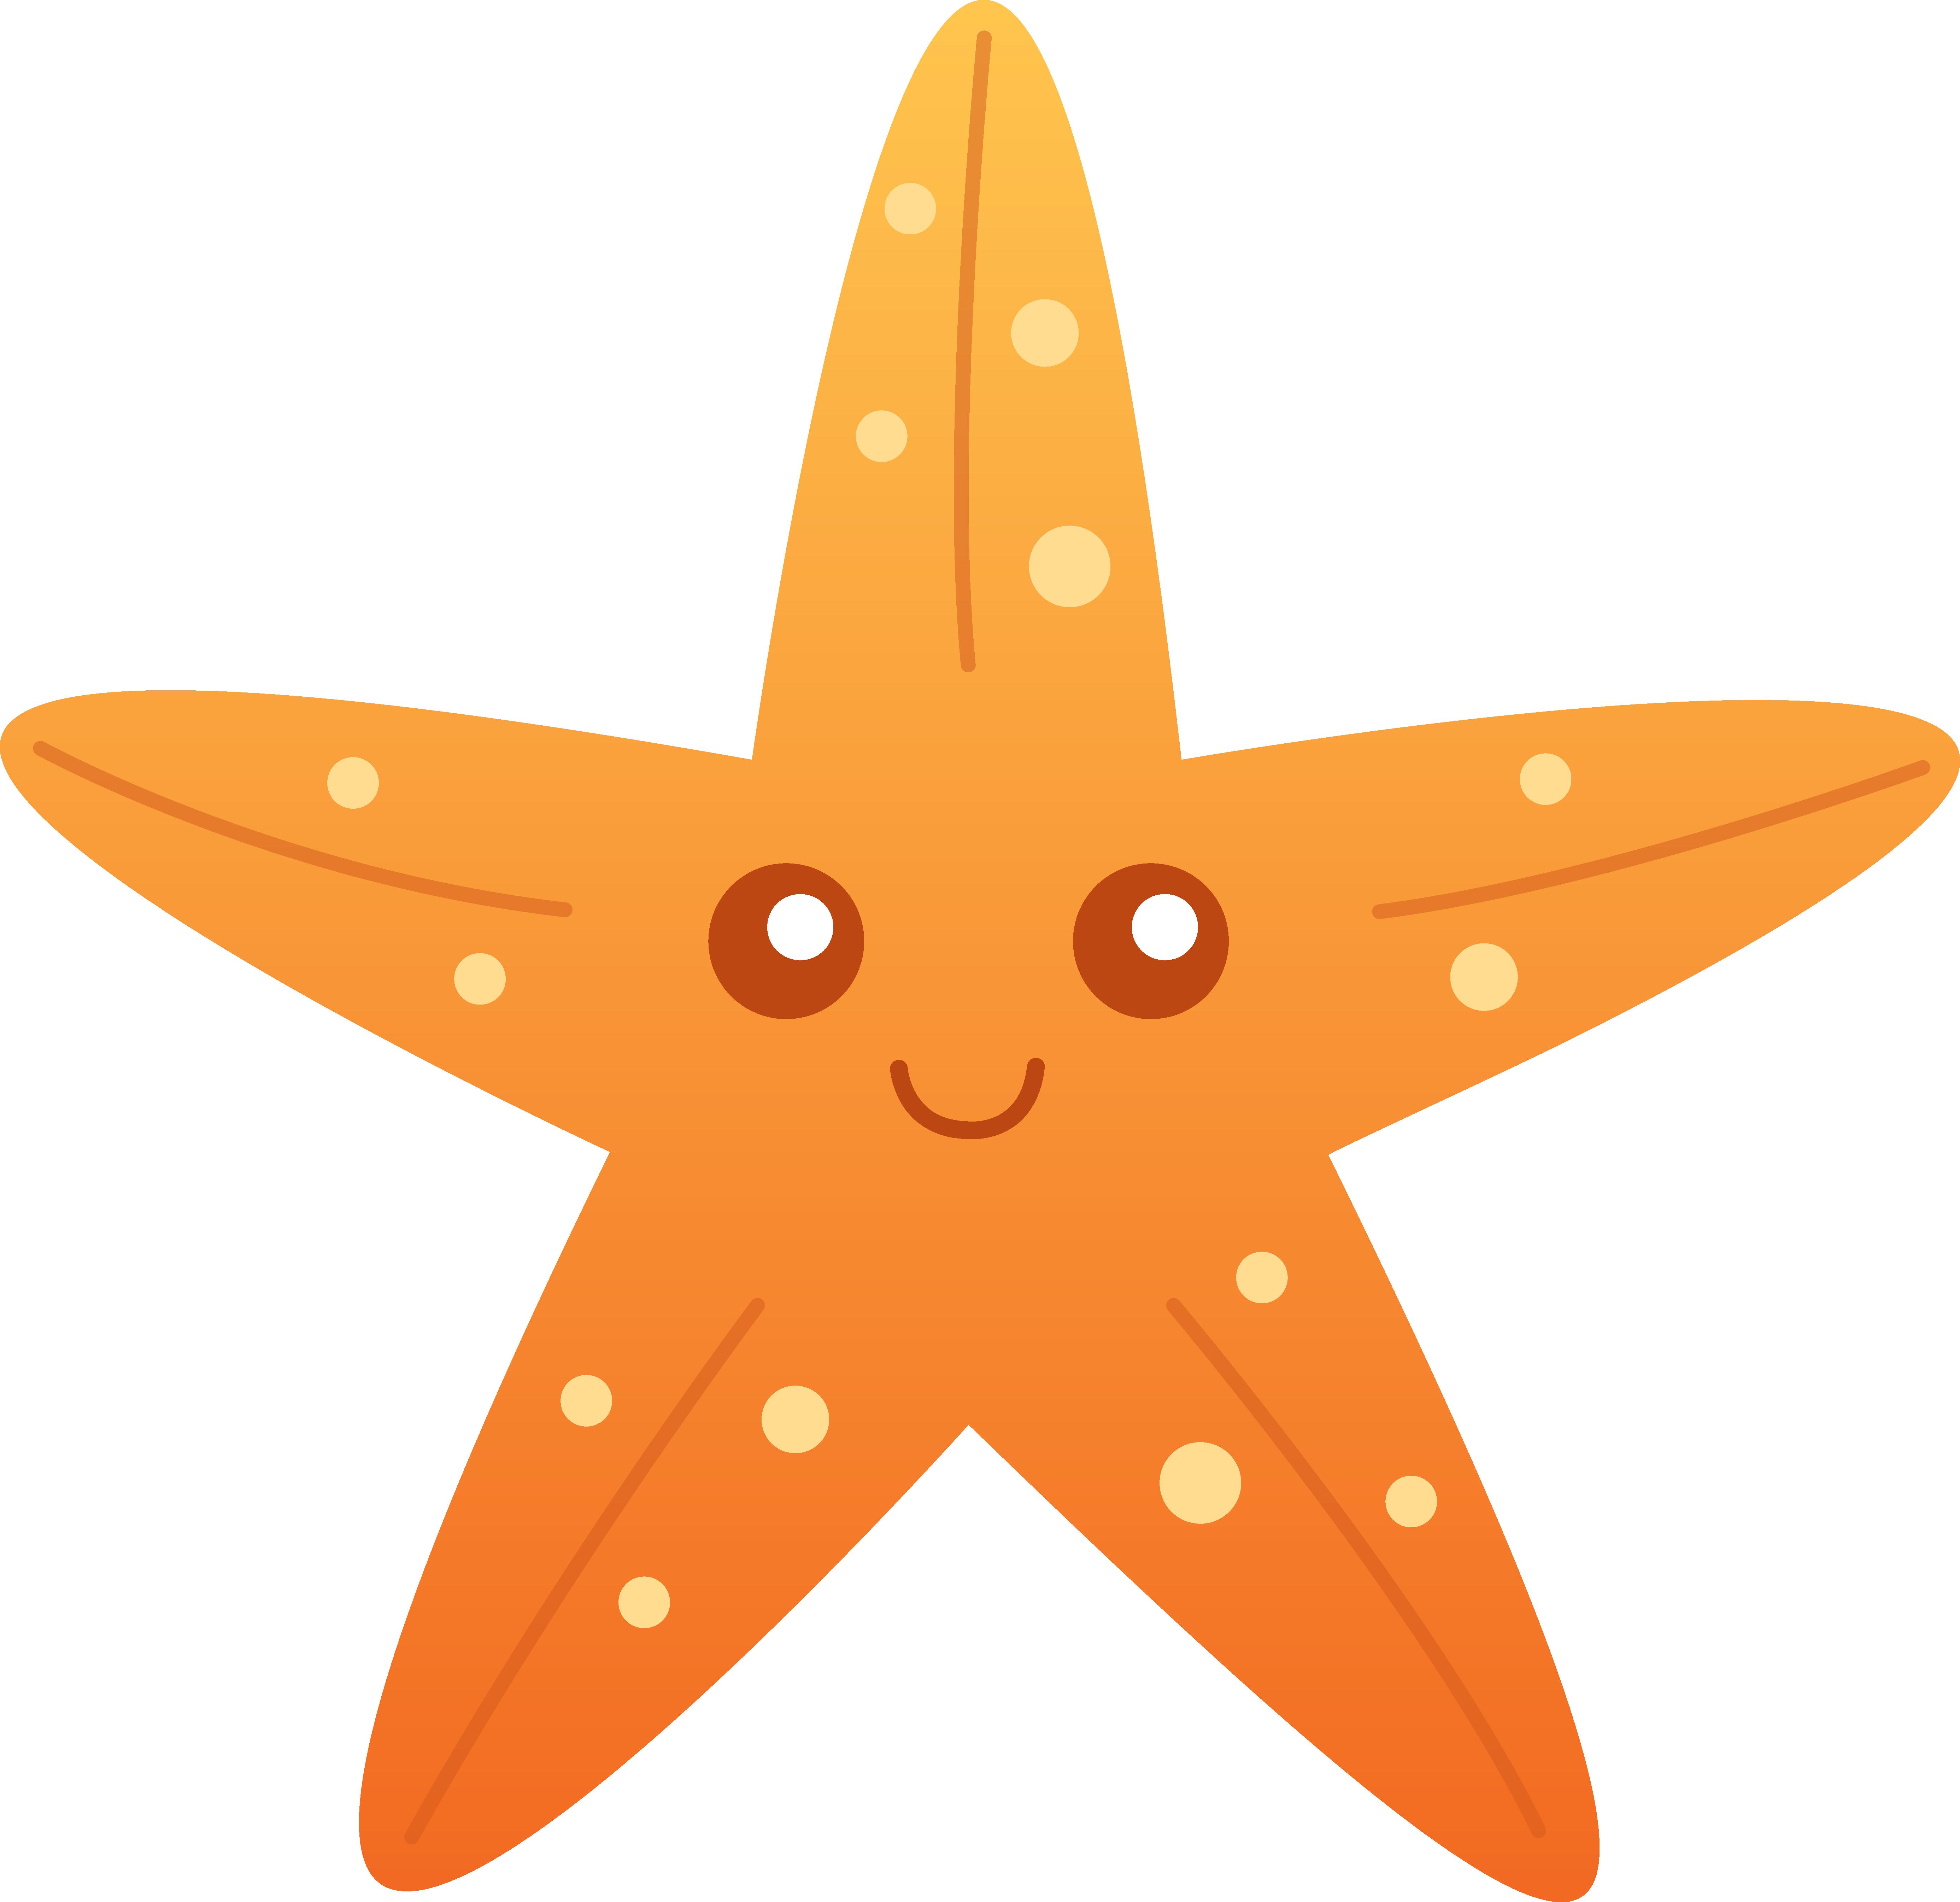 5546x5381 Blue Starfish Clip Art Clipart Panda